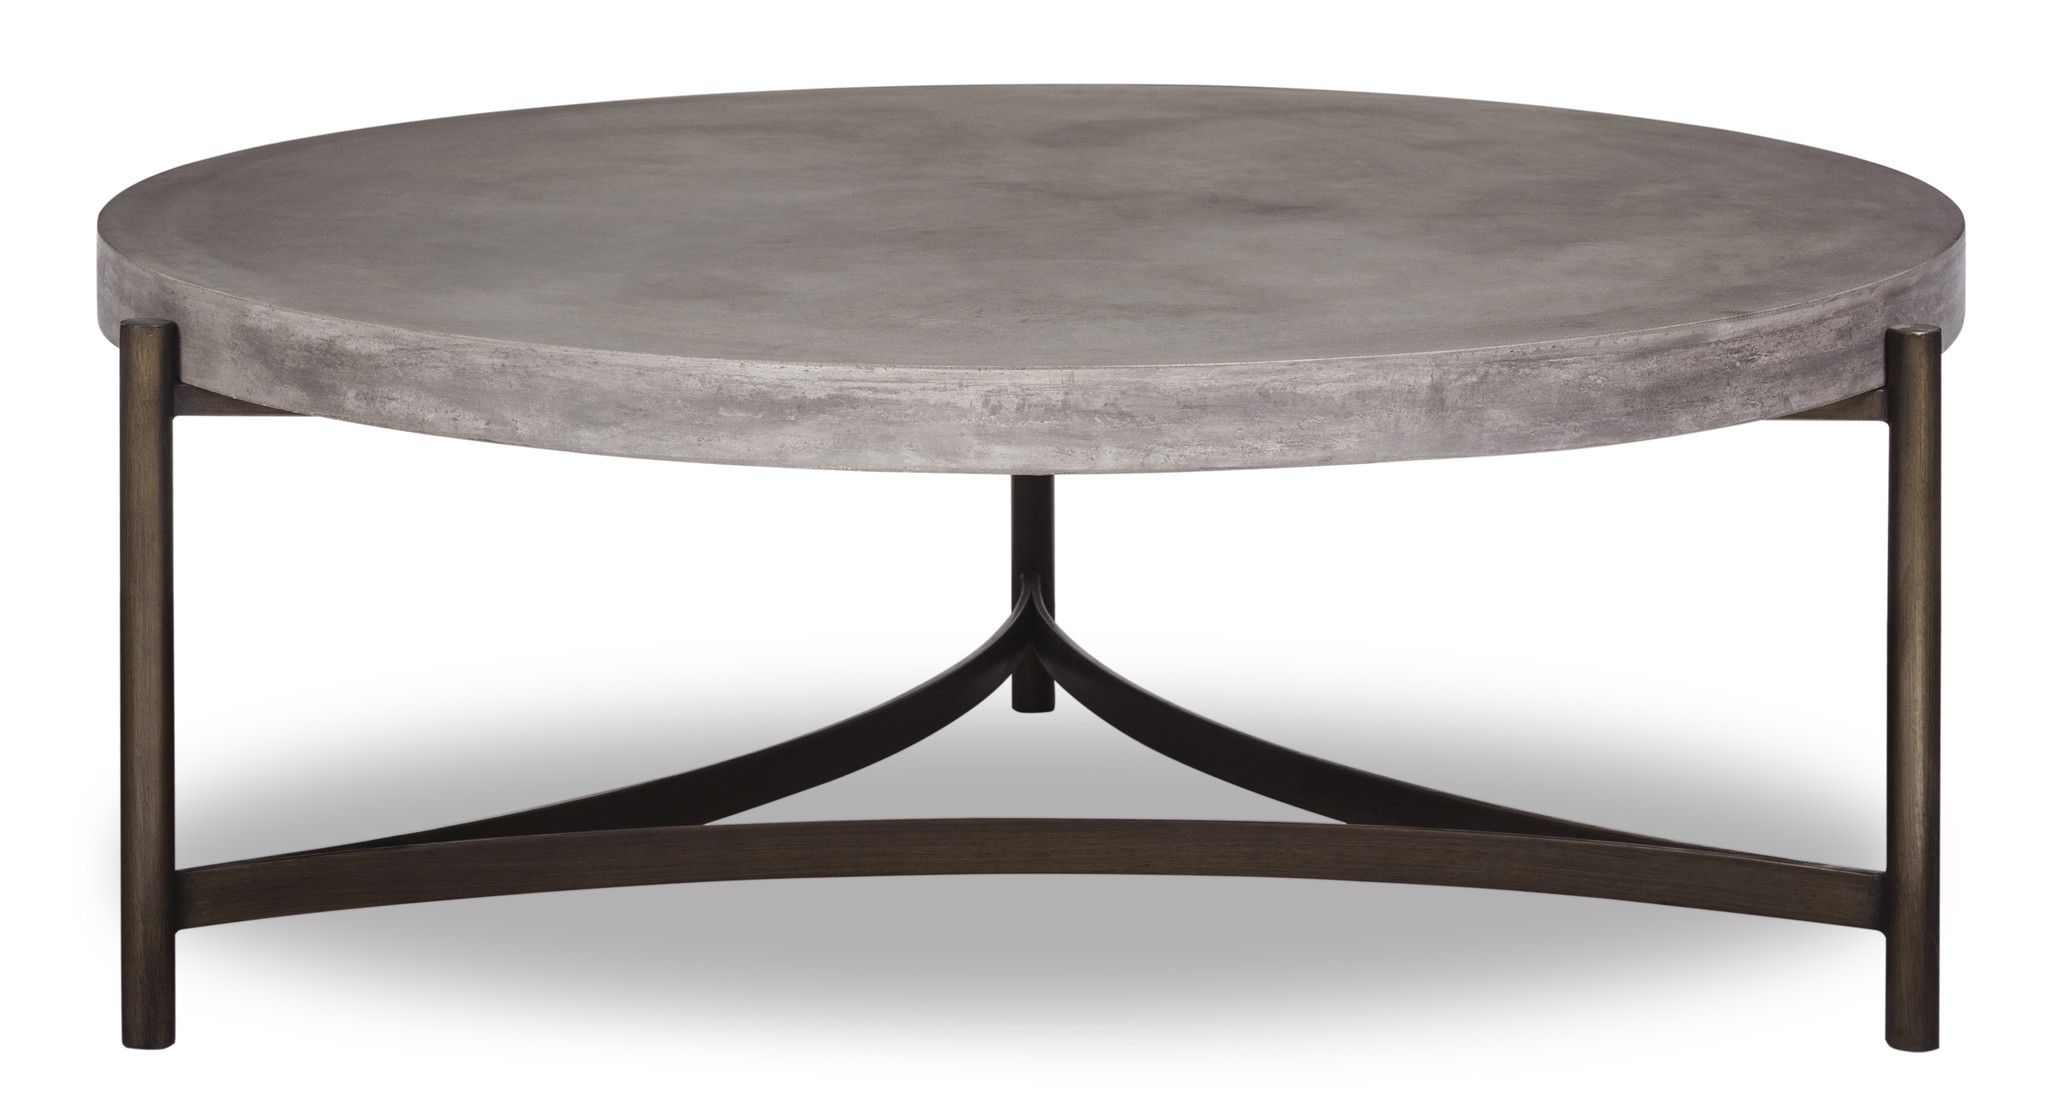 Washington Round Coffee Table Round Coffee Table Coffee Table